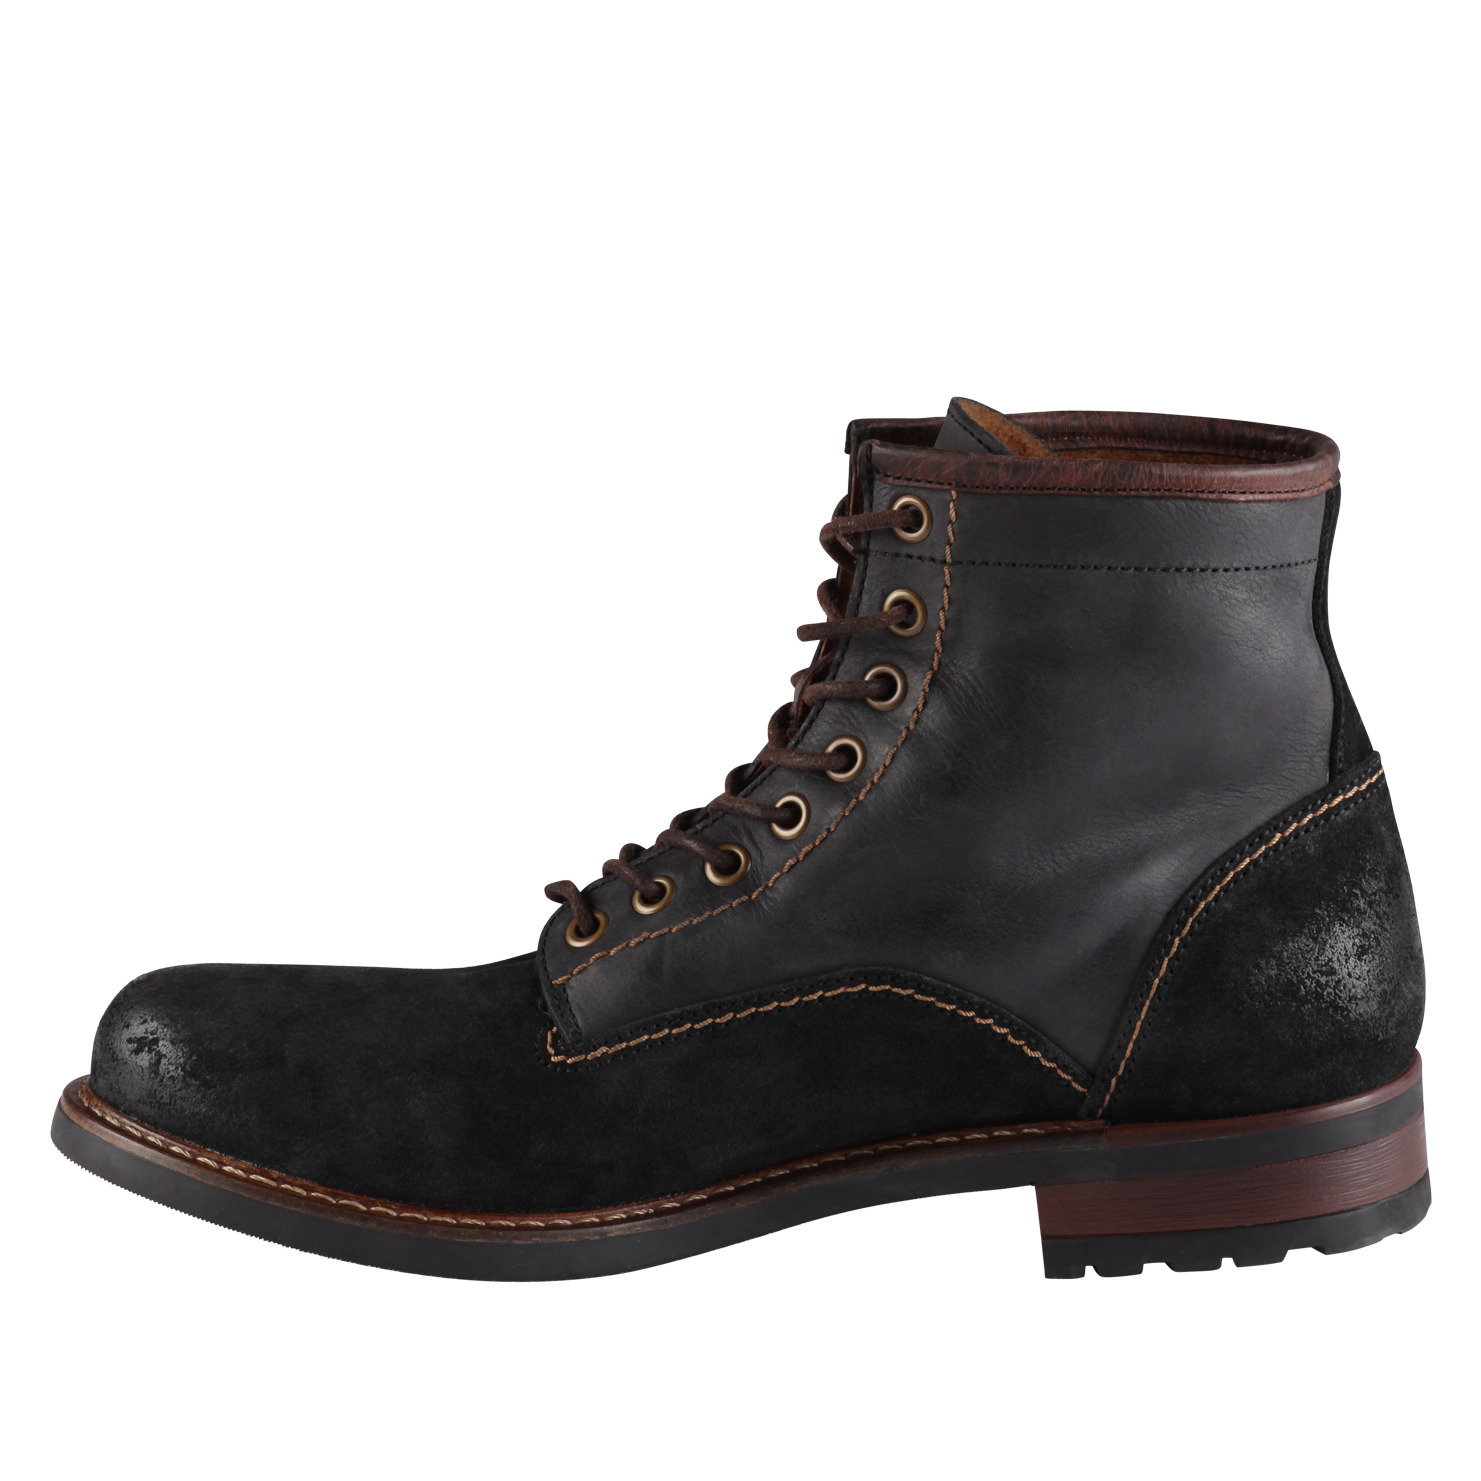 Aldo Men Shoes Alligator Boots